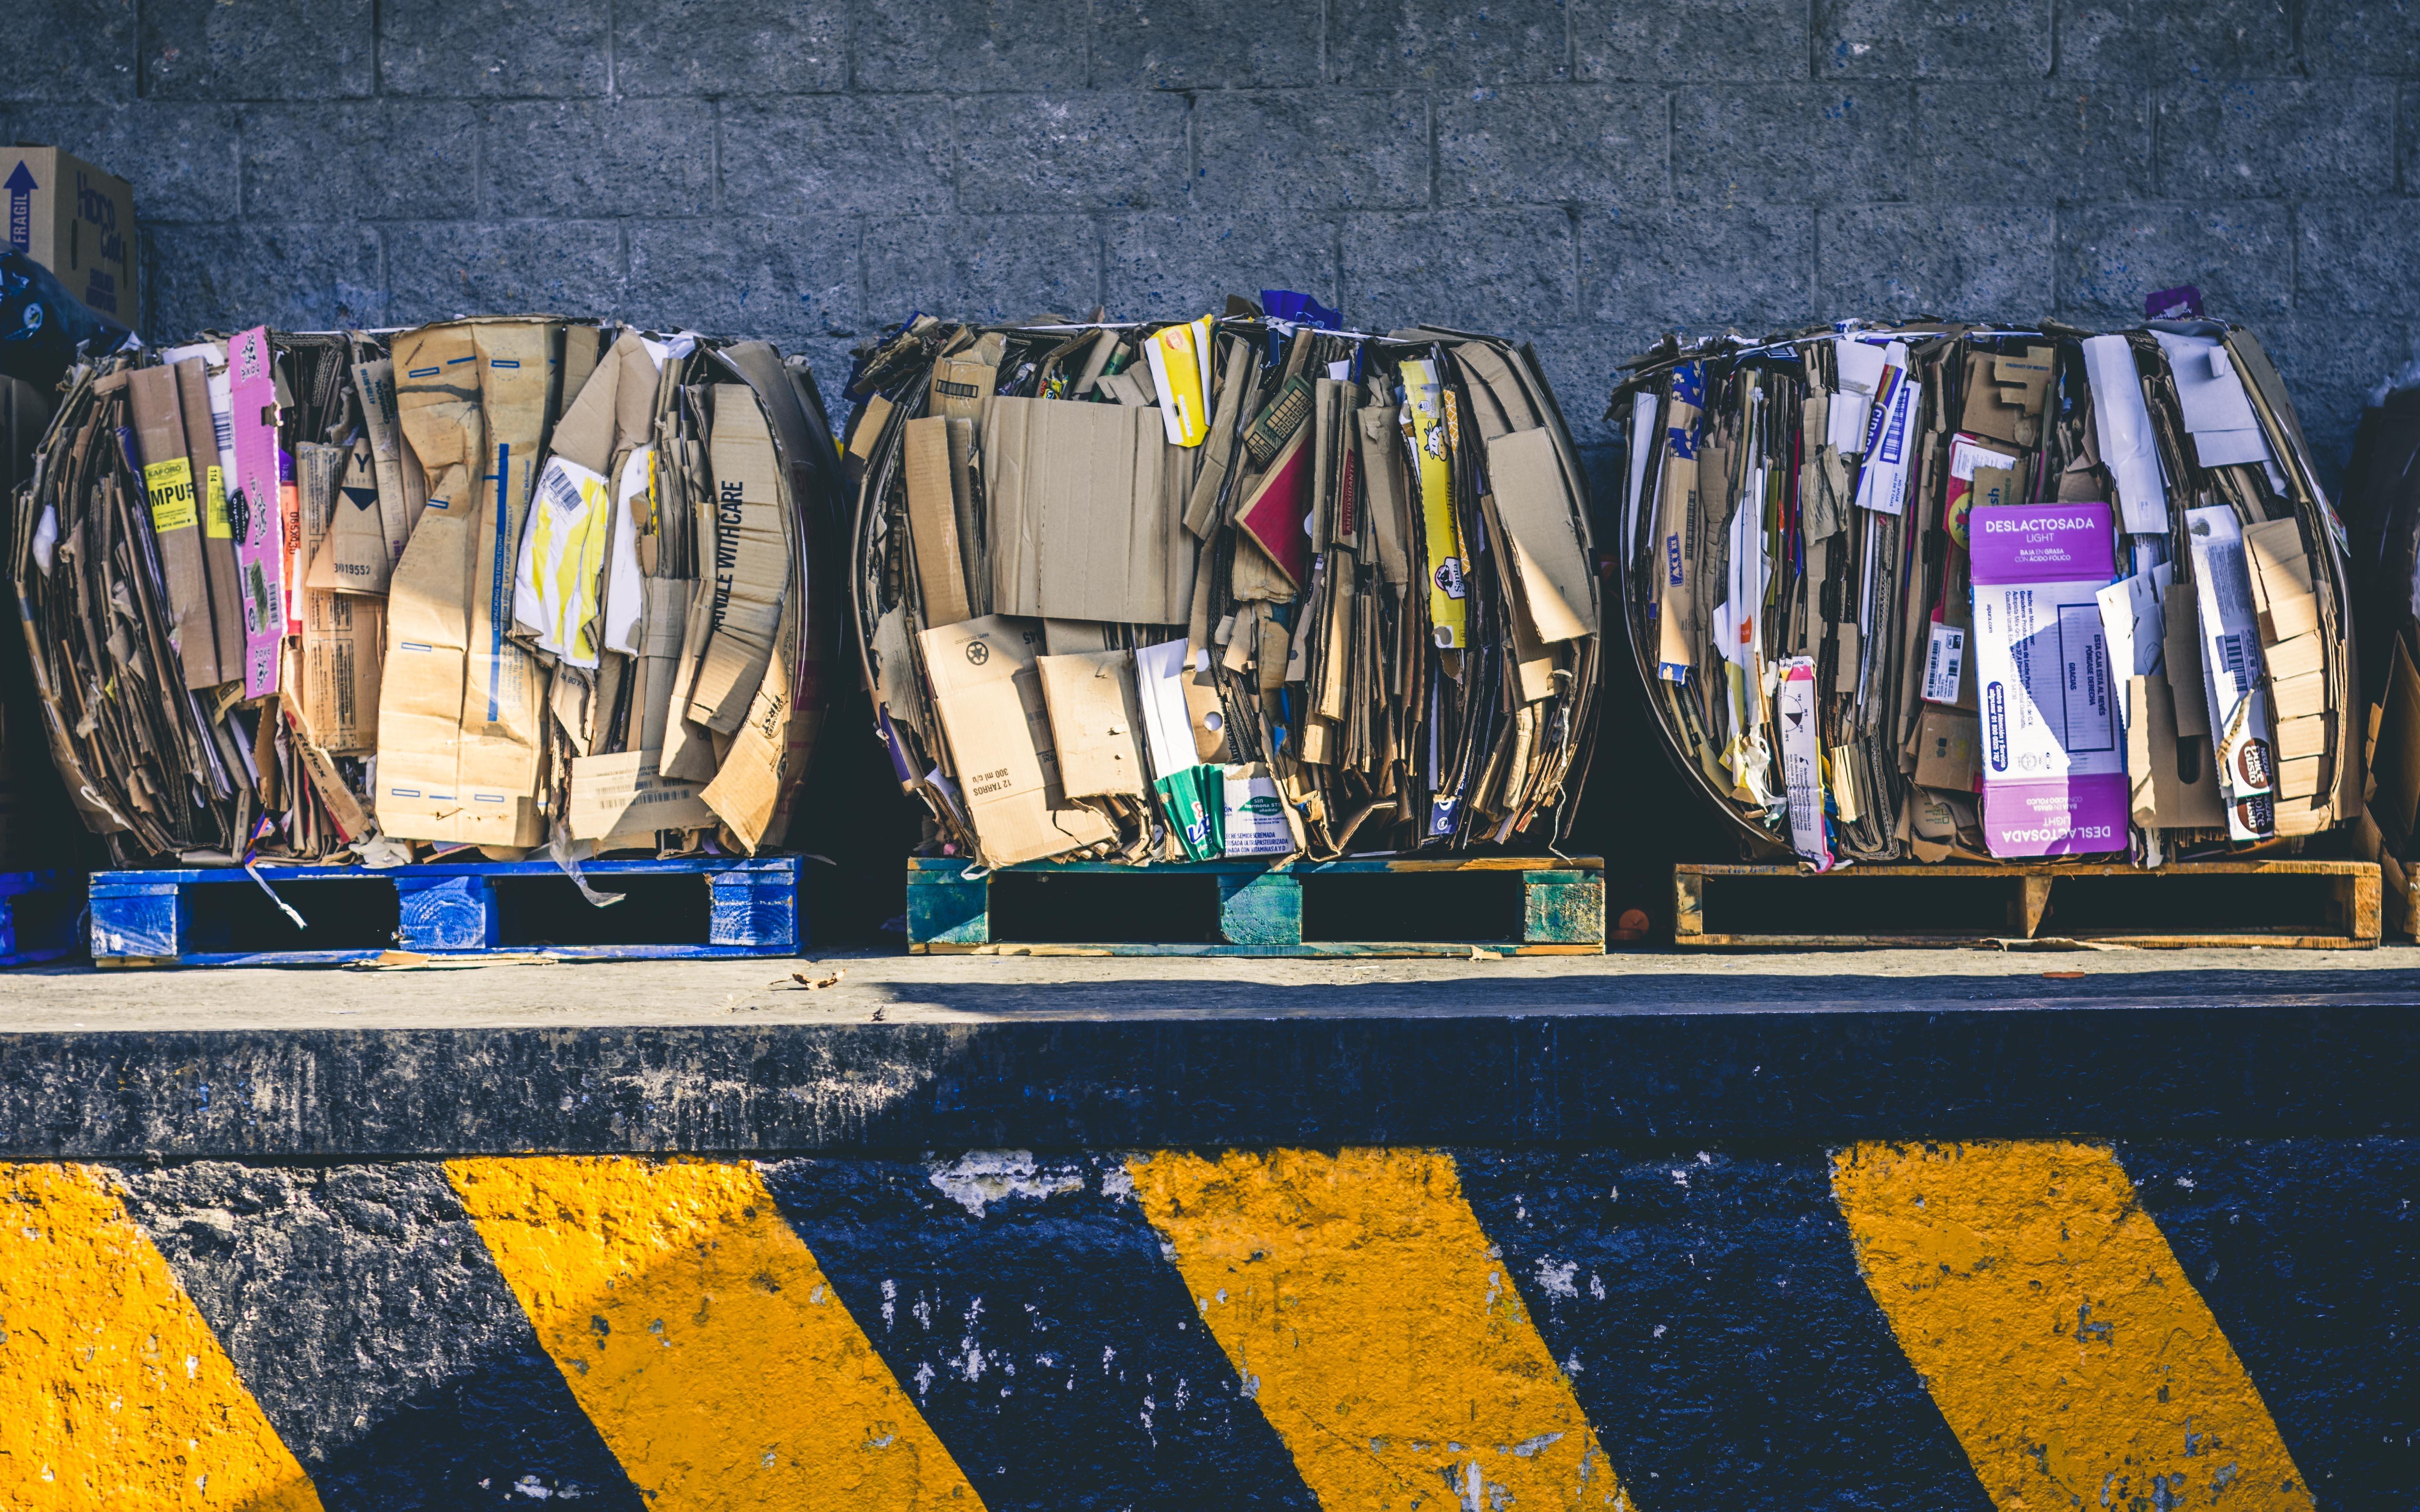 Karton / Papier Recycling